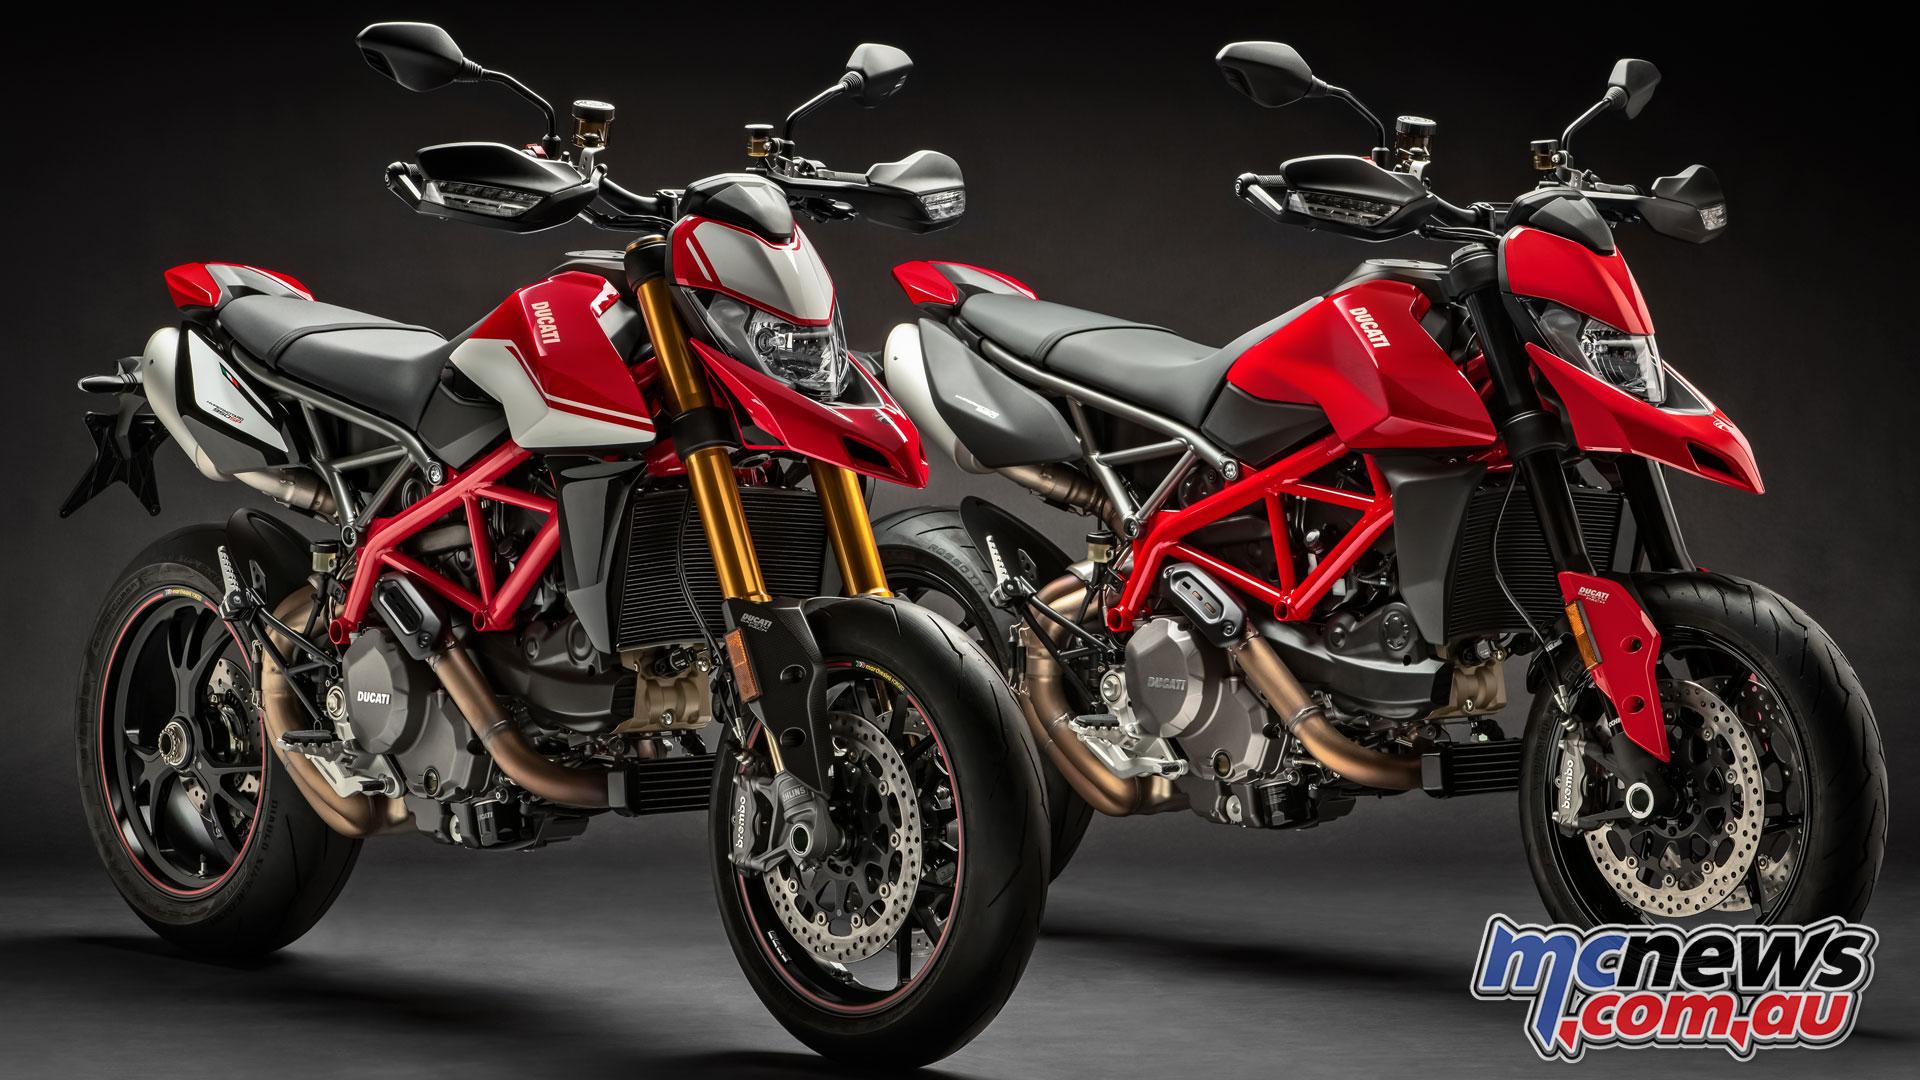 2019 Ducati Hypermotard 950 950 Sp Mcnewscomau